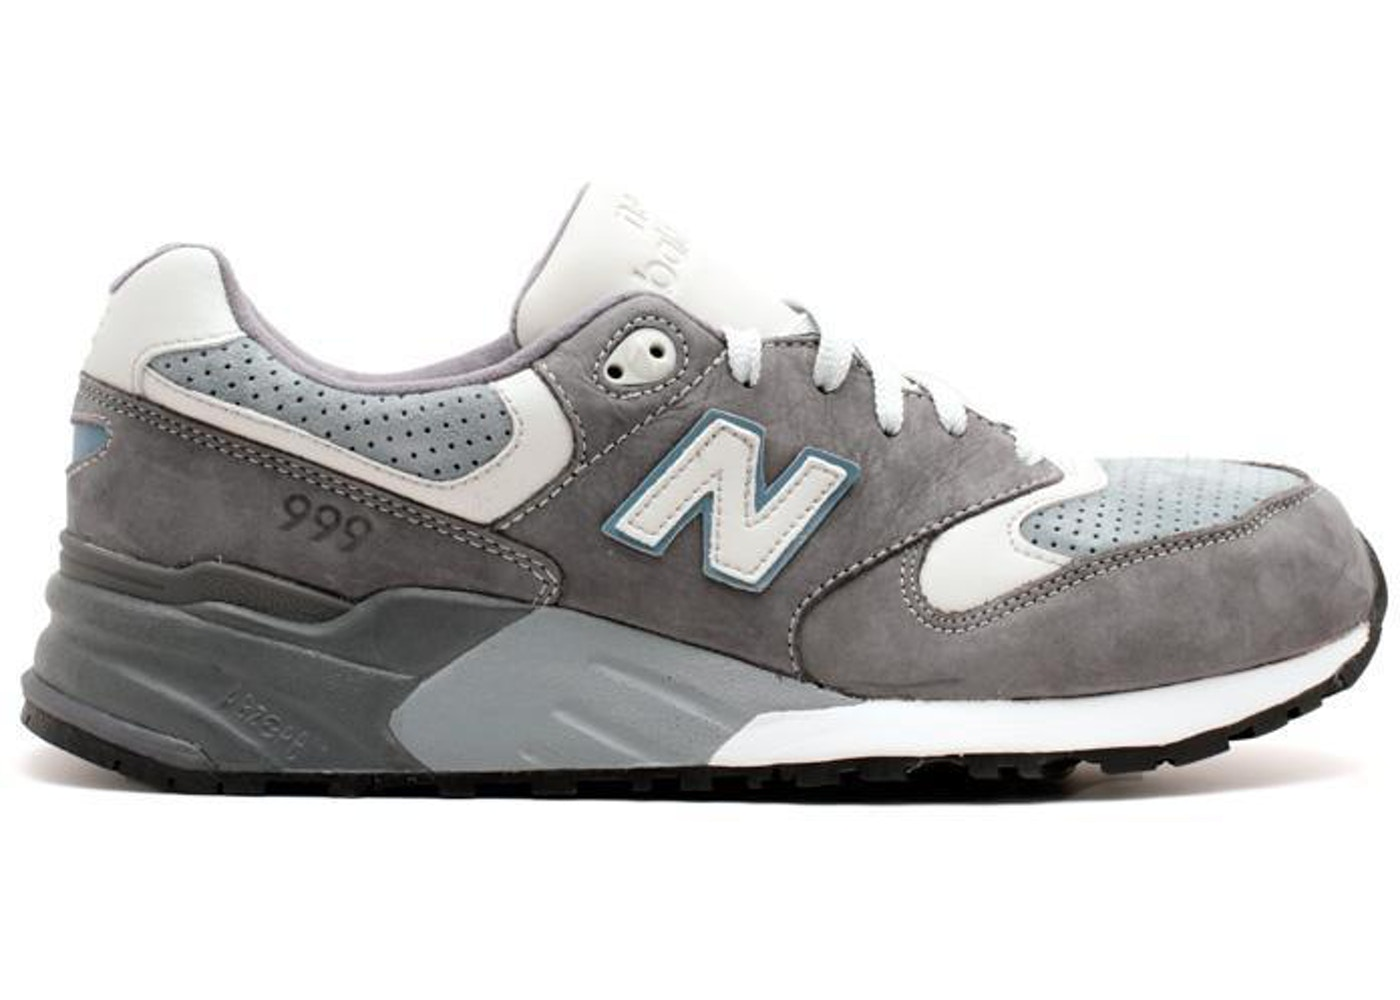 best sneakers 4fbaf 28629 New Balance 999 Ronnie Fieg